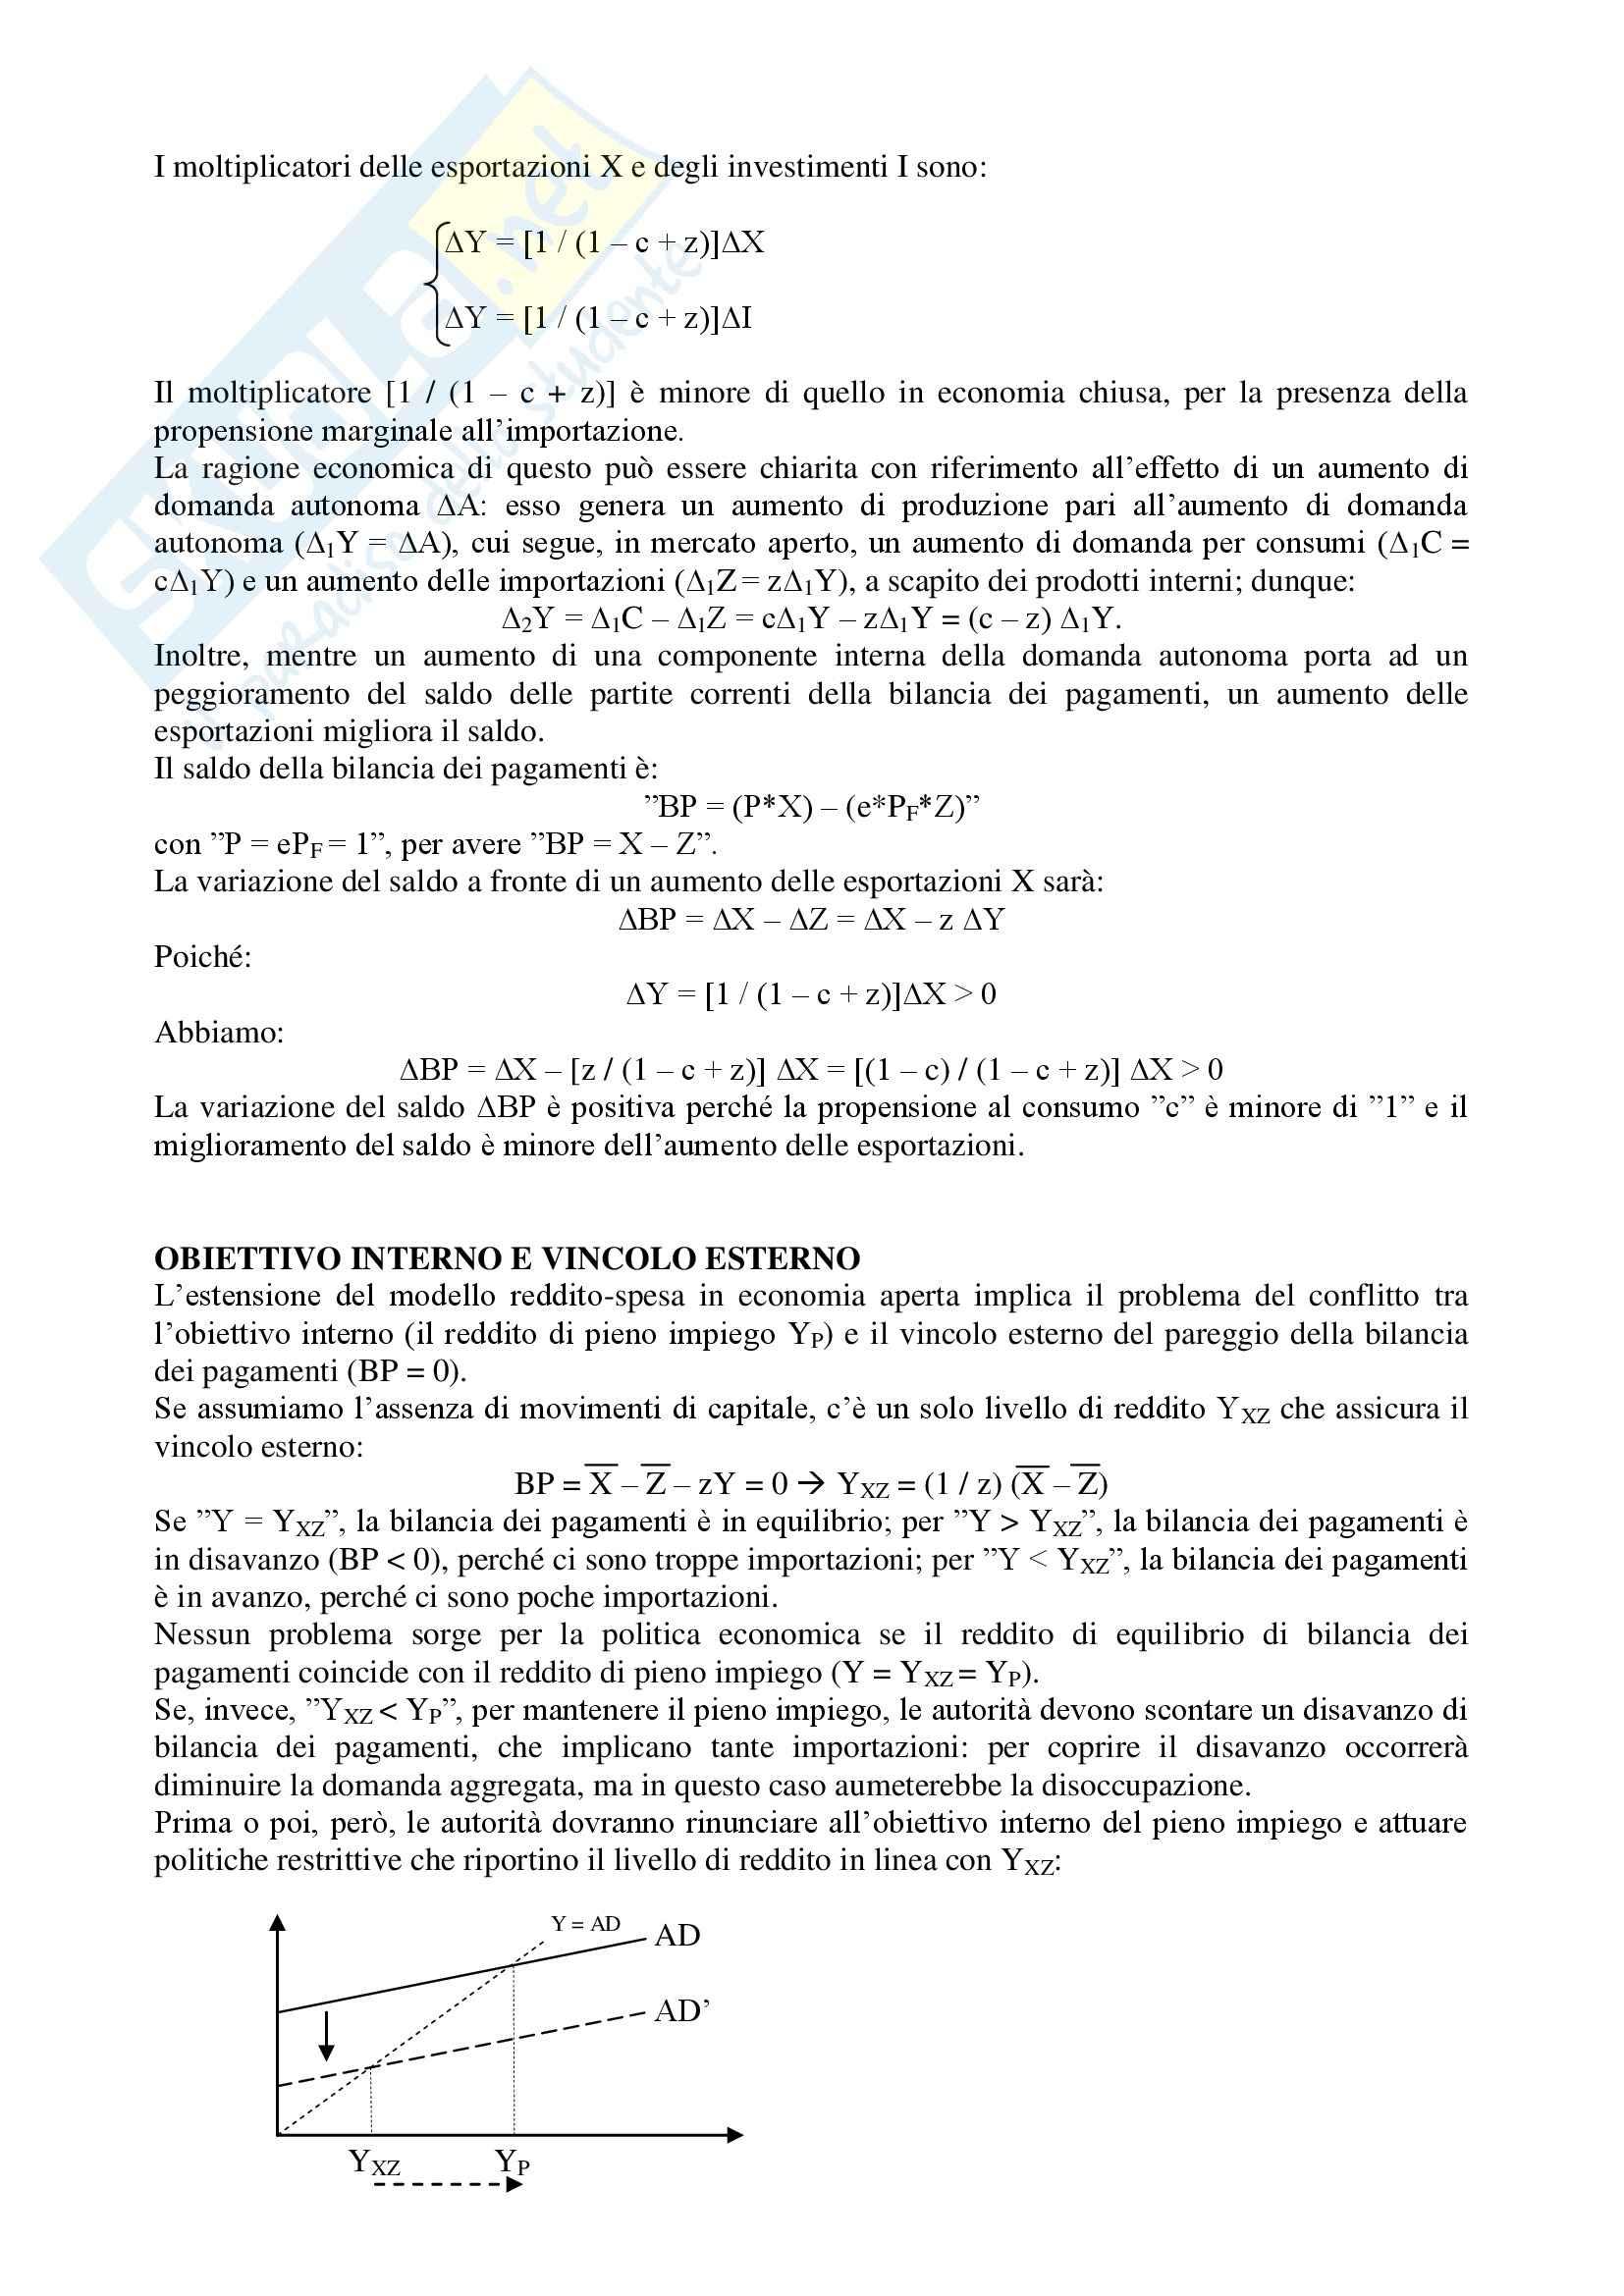 Macroeconomia - Appunti Pag. 31